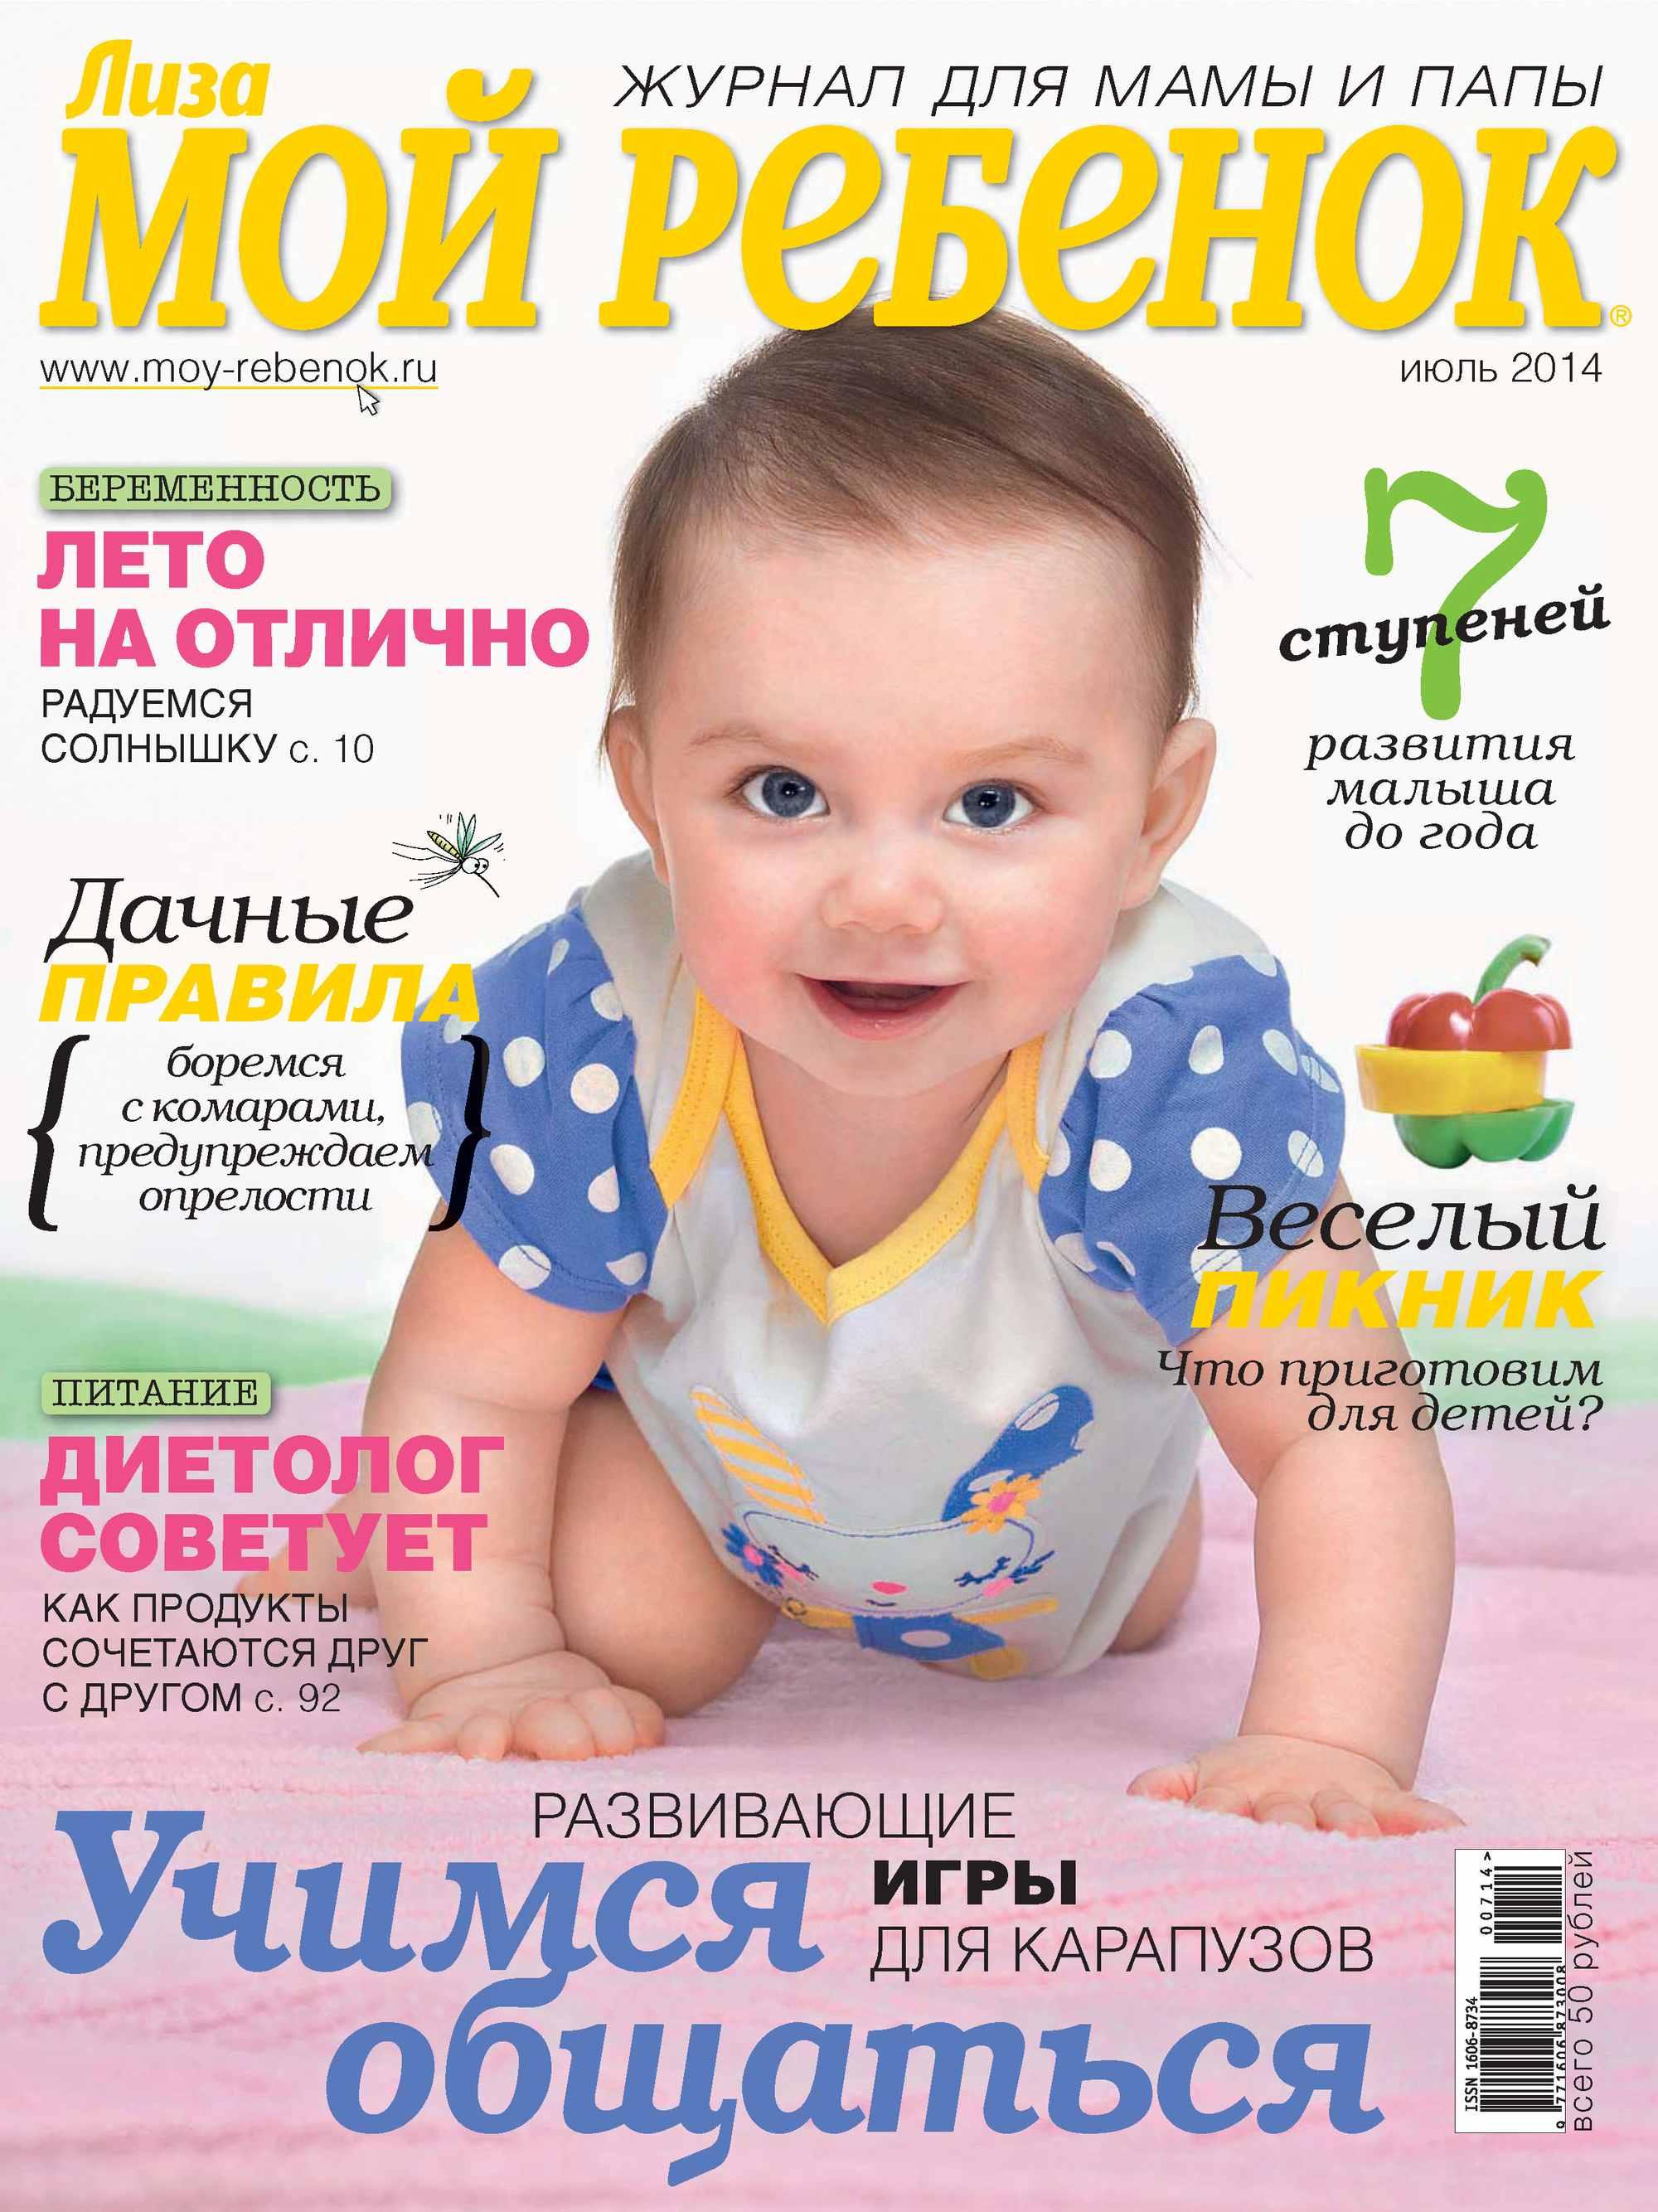 ИД «Бурда» Журнал «Лиза. Мой ребенок» №07/2014 ид бурда журнал лиза мой ребенок 11 2014